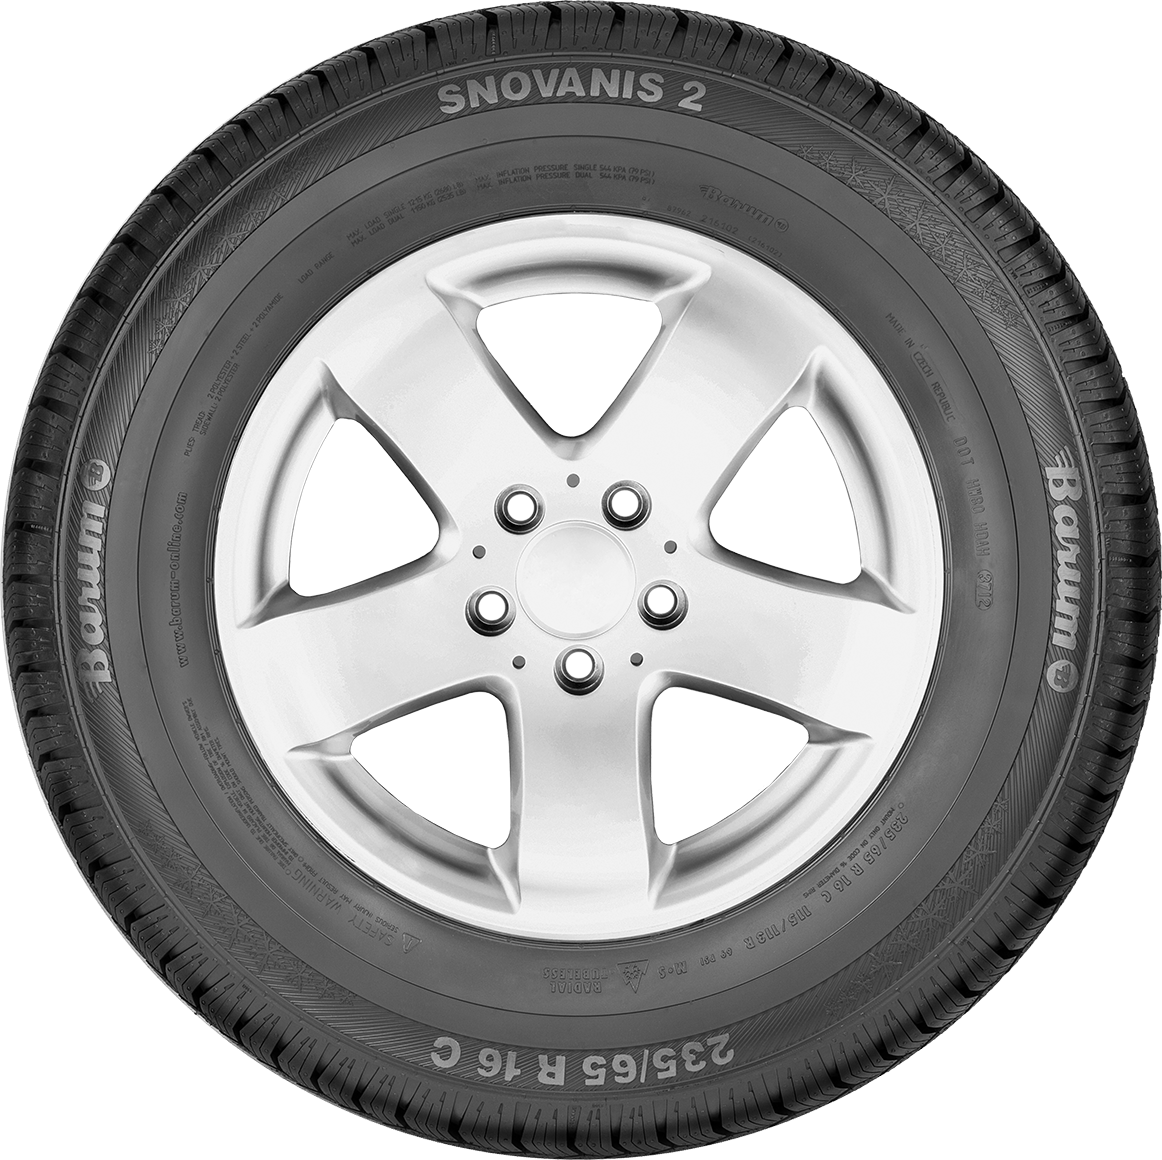 Bardzo dobryFantastyczny SnoVanis 2 - The Winter Tyre for Transporters & Vans for Snow QZ61